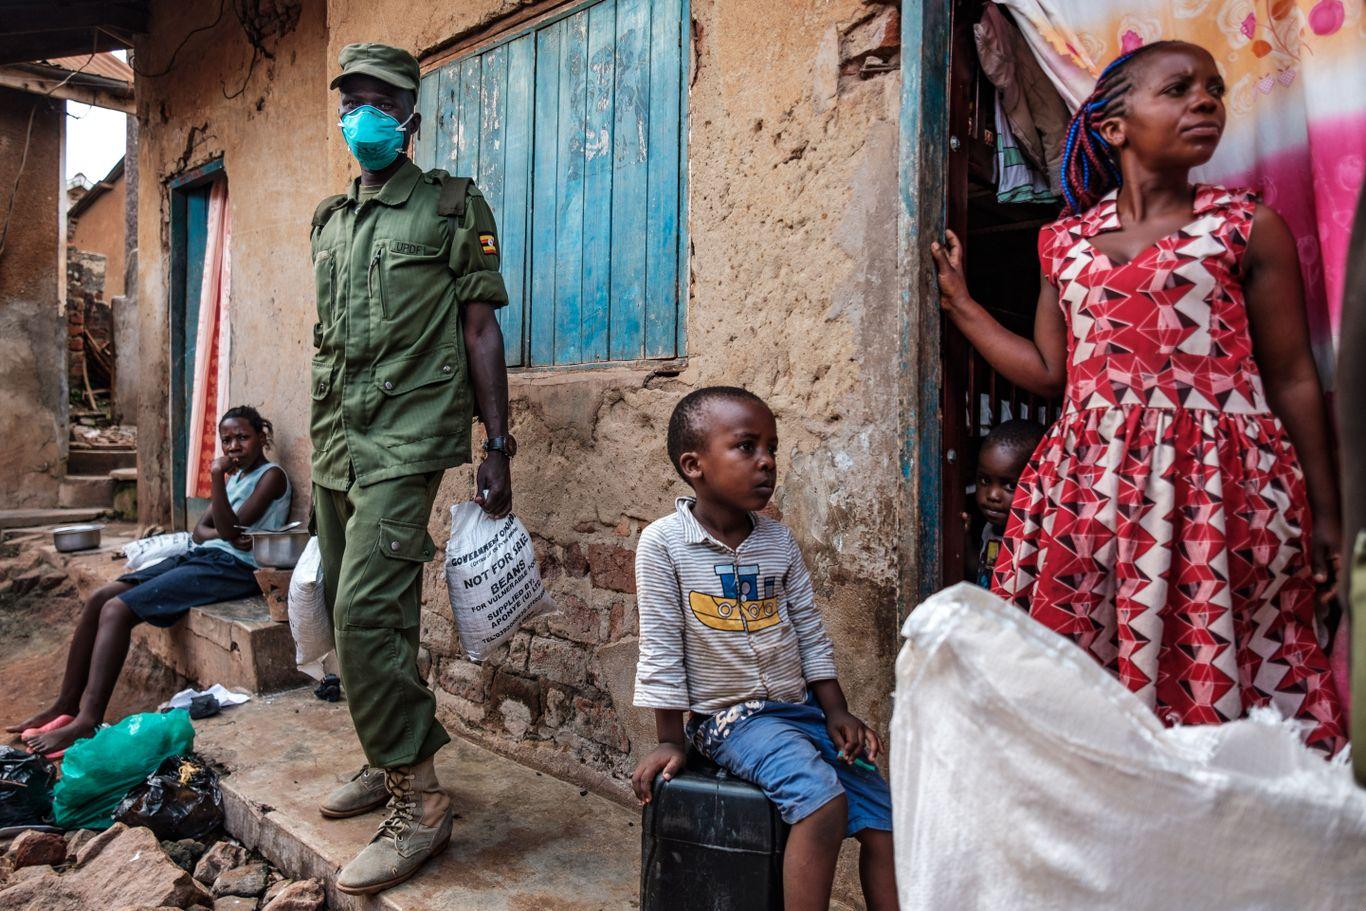 Coronavirus accelerates in Africa as financial injury deepens thumbnail